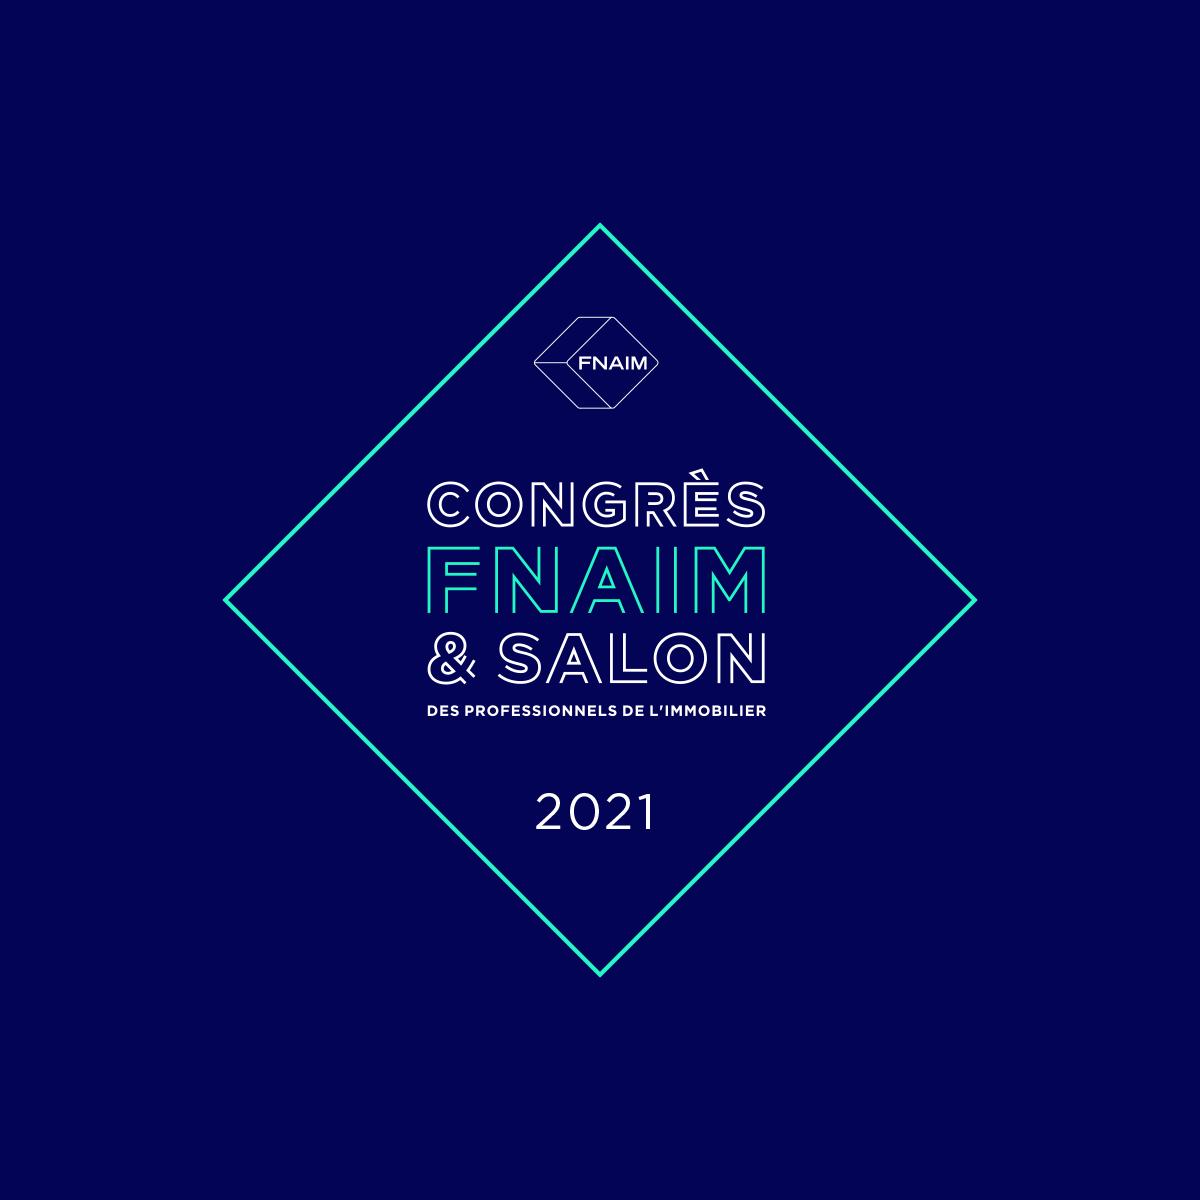 Congrès Immobilier FNAIM 2021